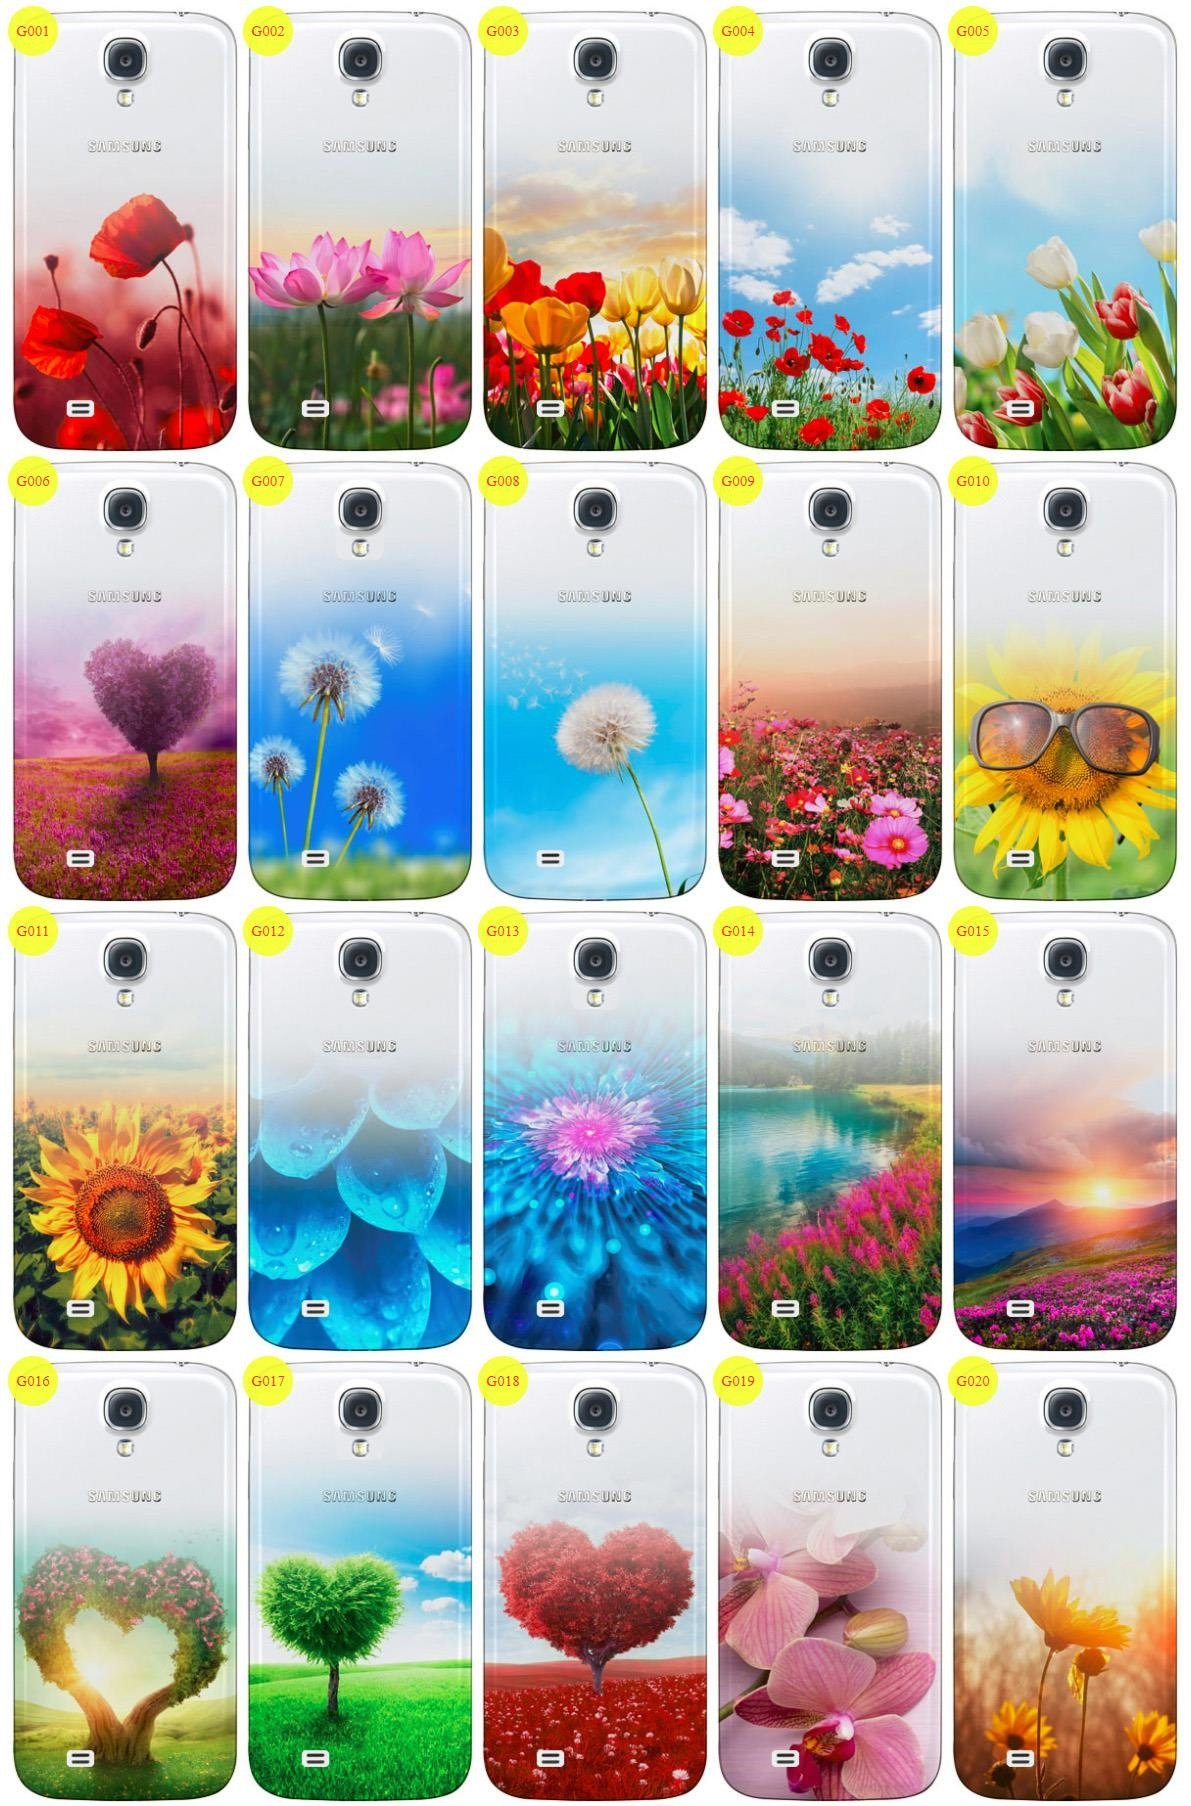 Promo Samsung Galaxy S4 I9500 Termurah 2018 Sinkgard Premium Series Food Waste Disposer Alat Penghancur Case Cover Overprint Kreatui Gradient Glass Click To Zoom